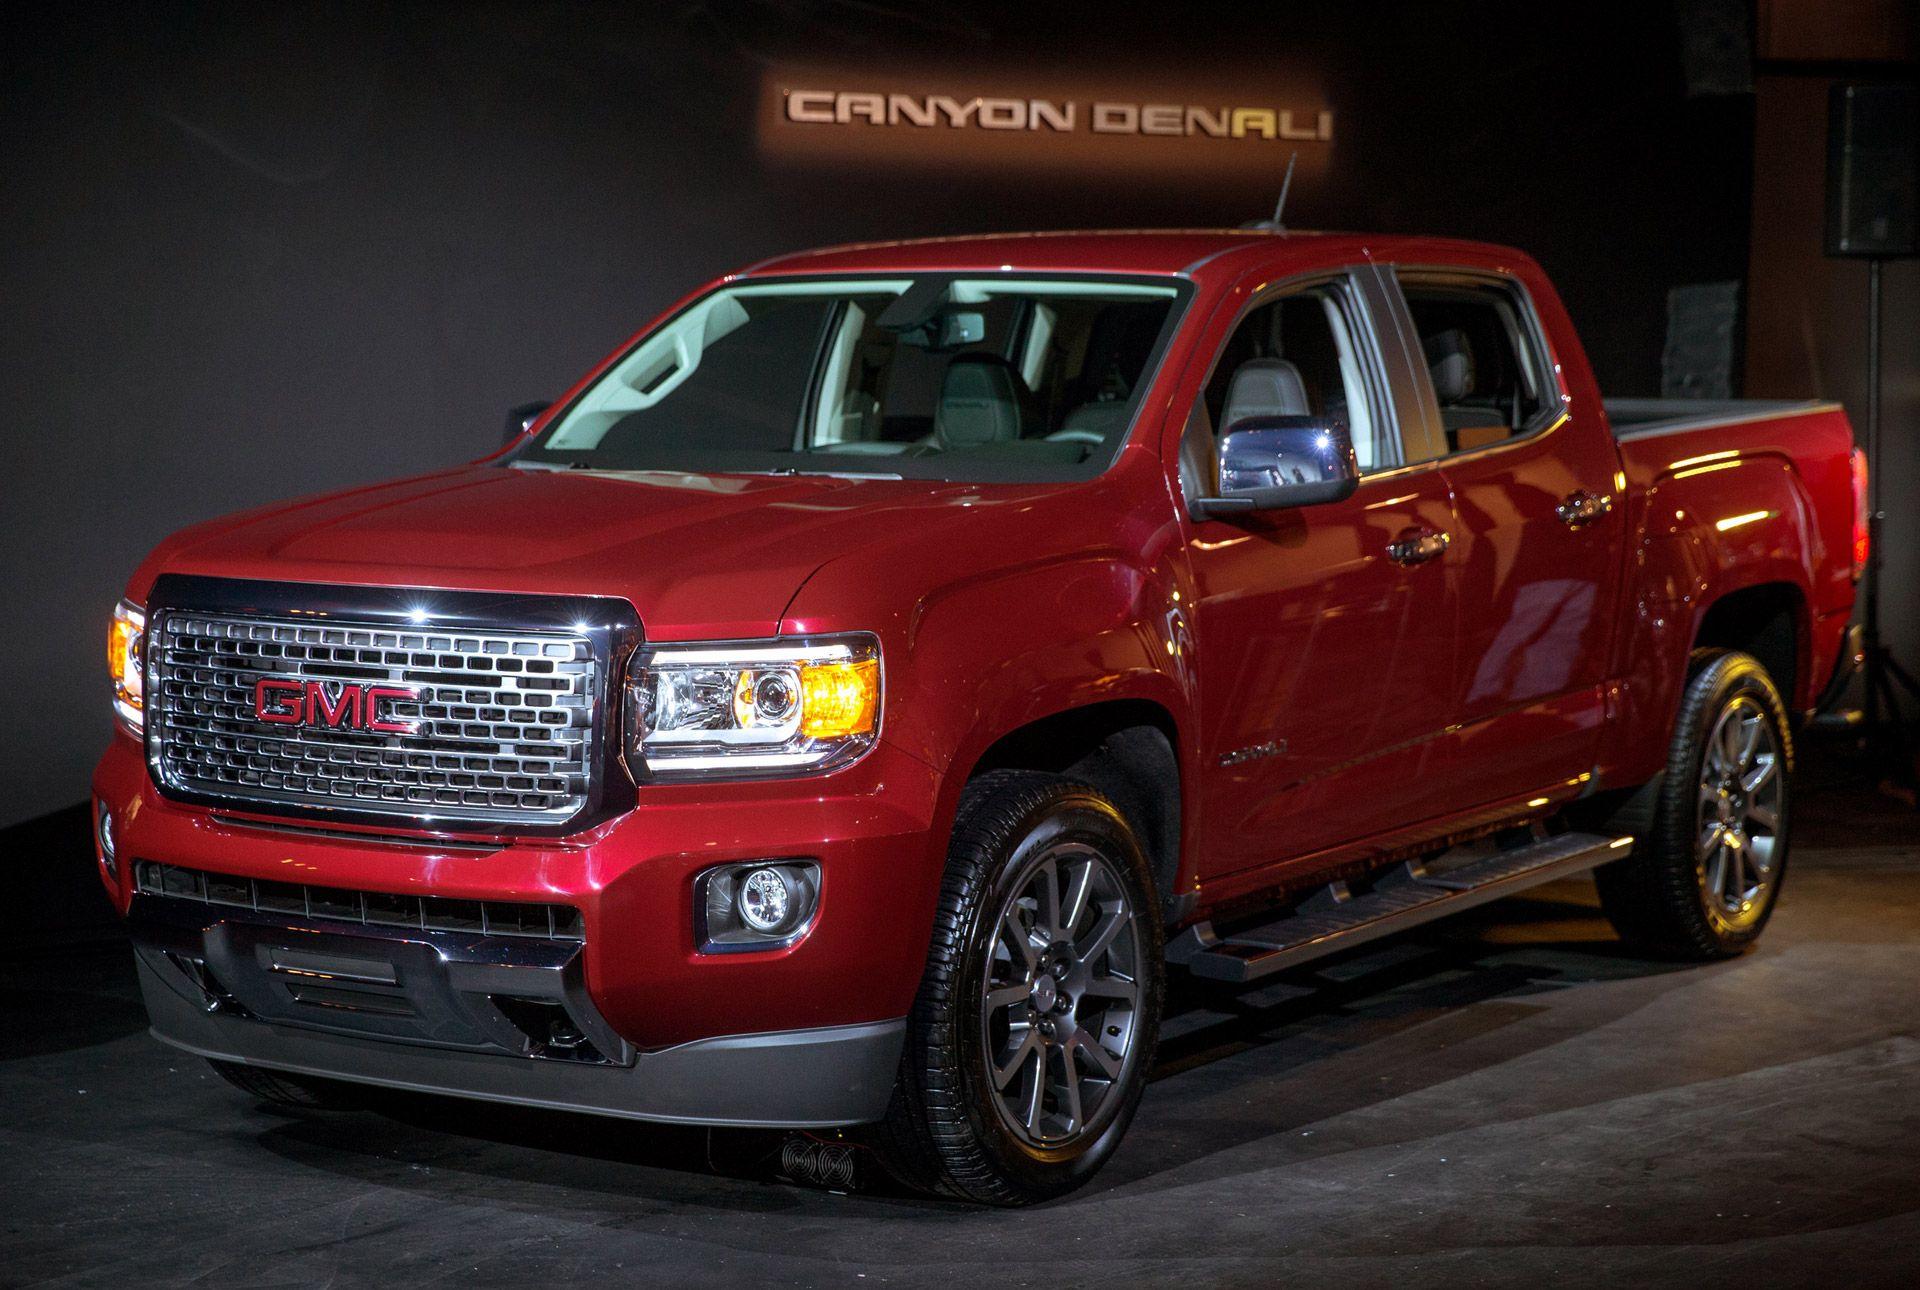 2017 gmc canyon denali diesel release date